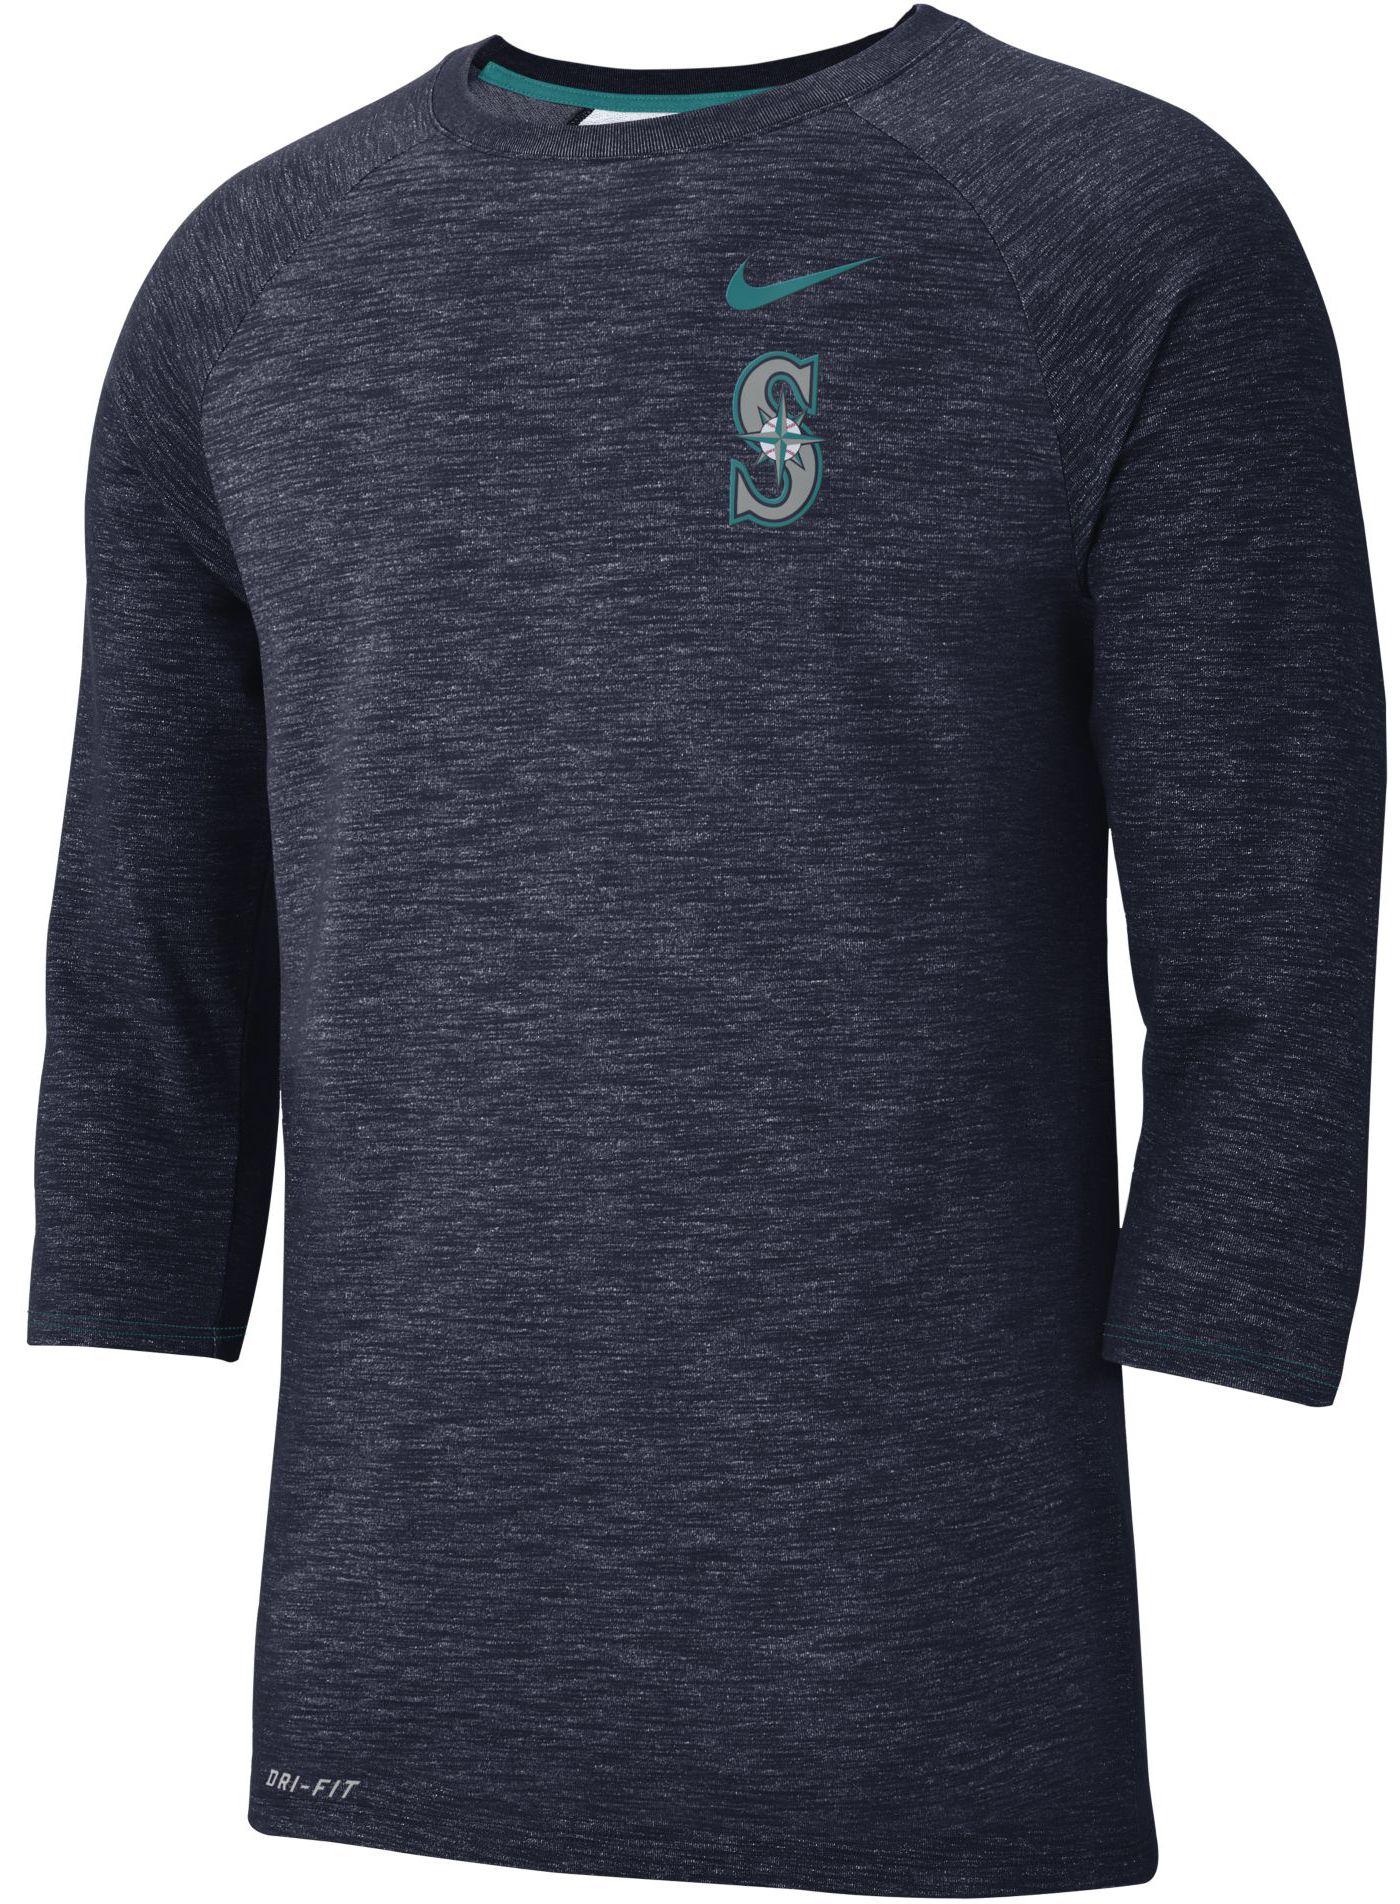 Nike Men's Seattle Mariners Dri-FIT Slub Three-Quarter Sleeve Shirt